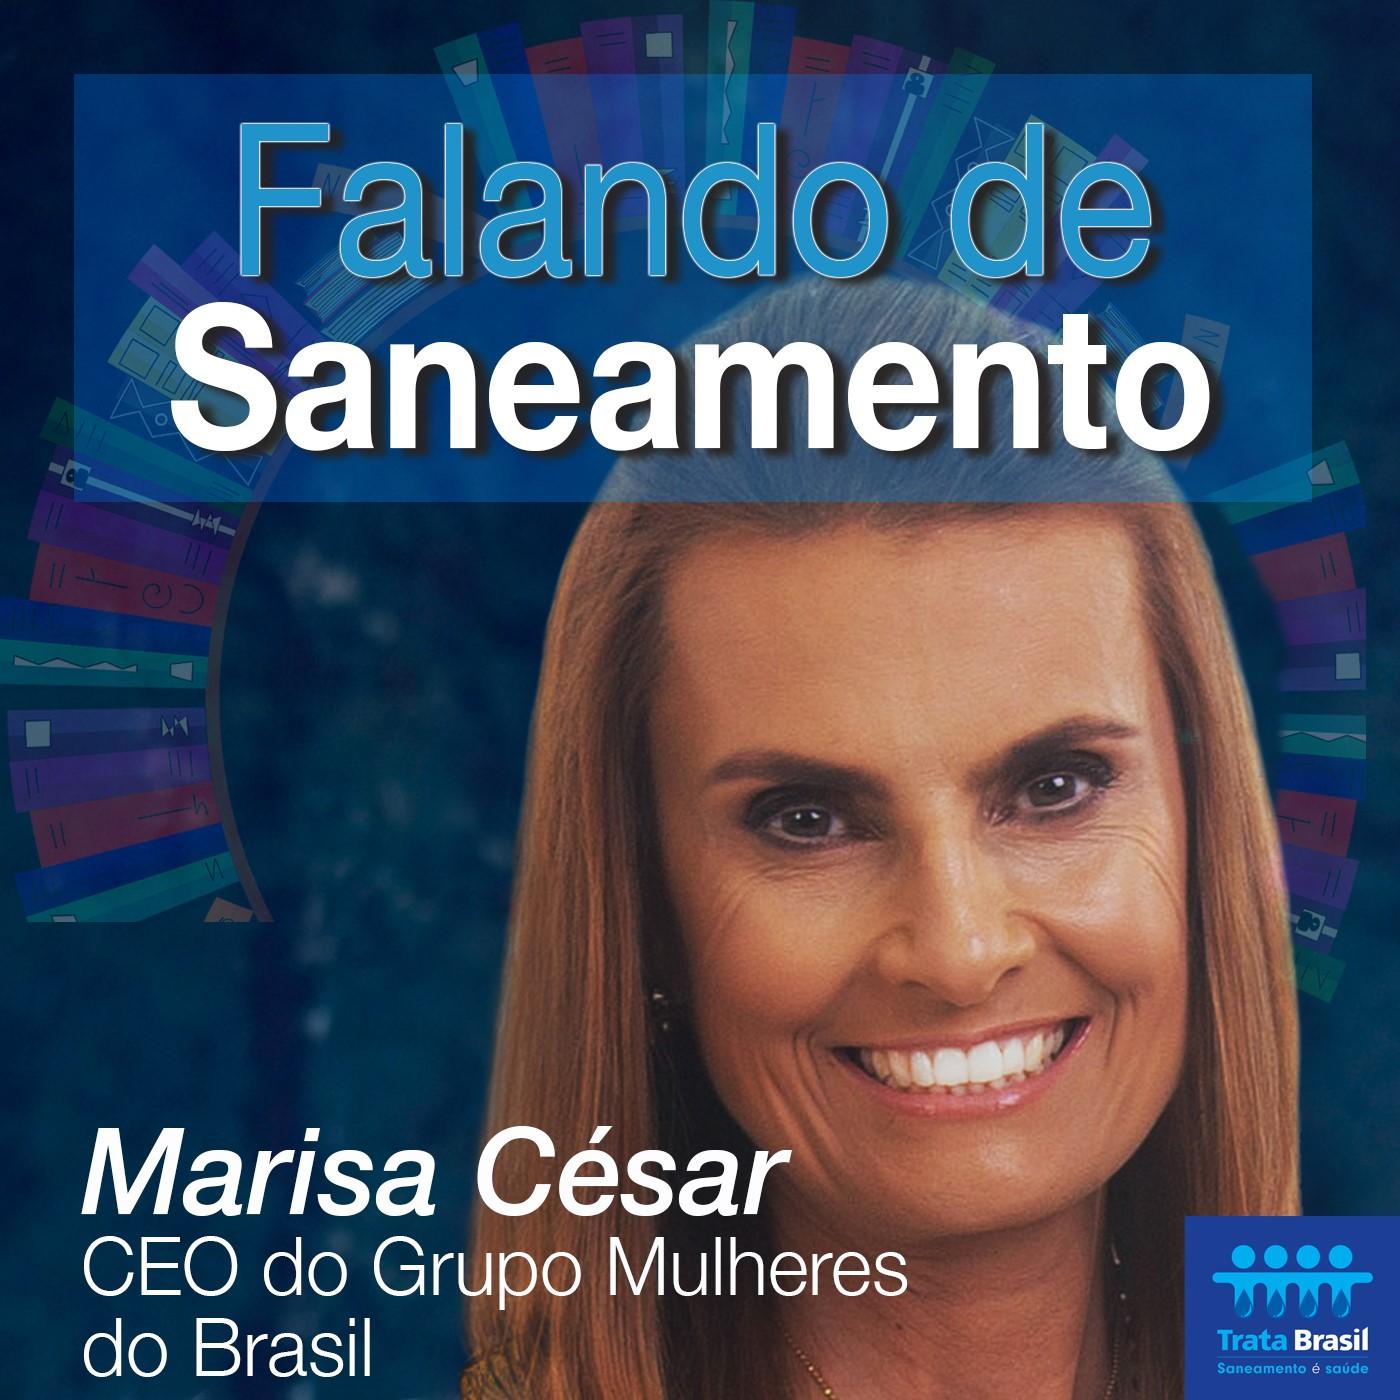 Grupo Mulheres do Brasil acredita no saneamento como indicador de igualdade